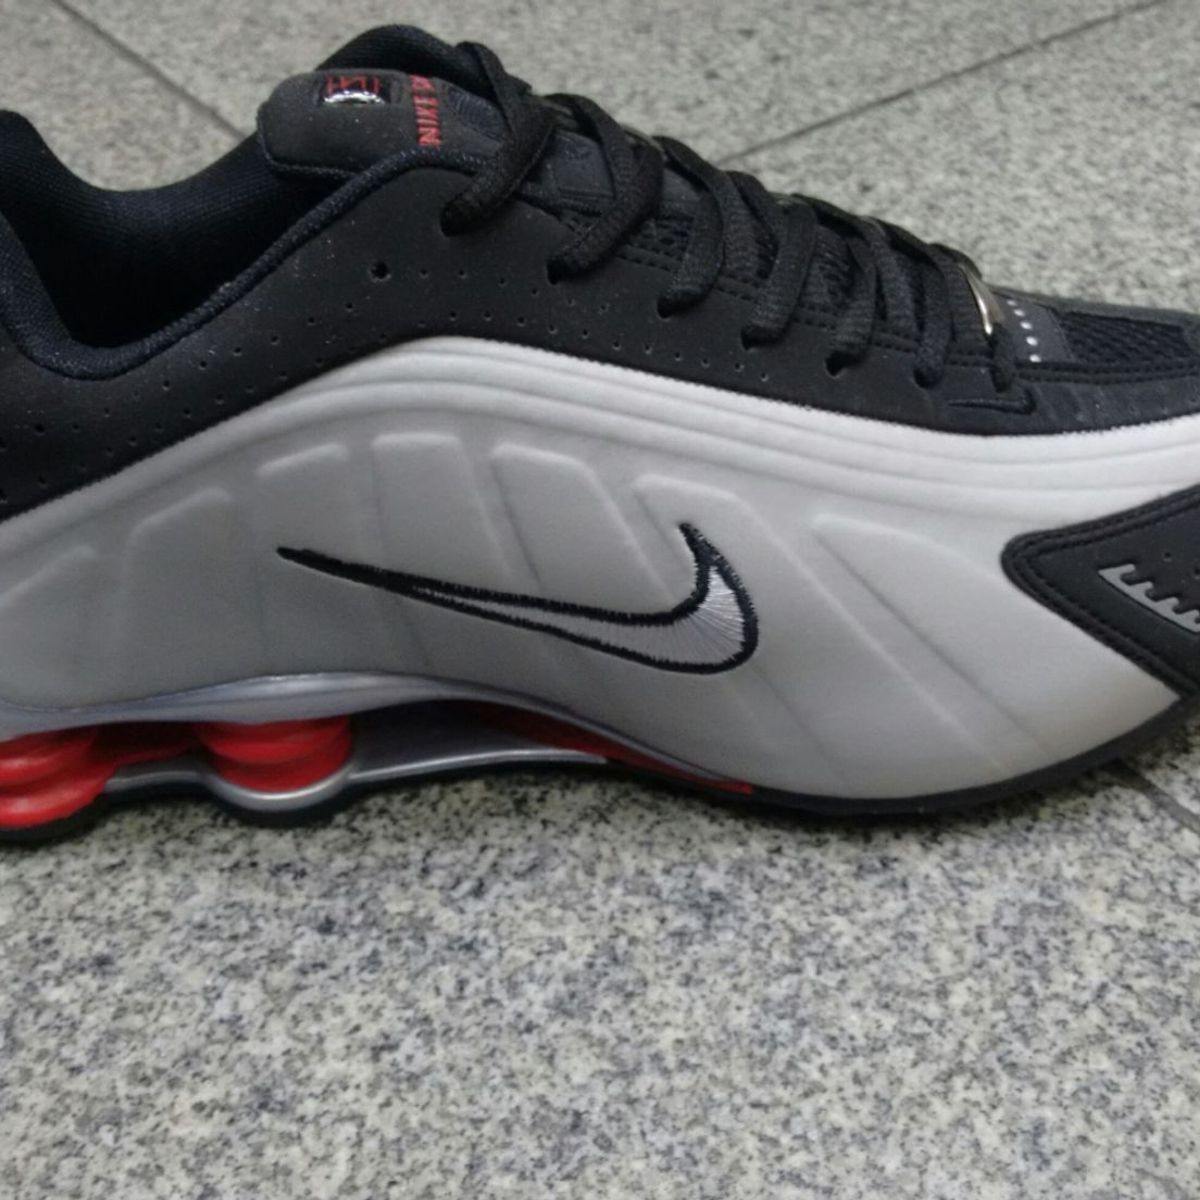 new product b25be 6ae72 Tenis Nike Shox R4 Original Preto vermelho Número 41   Tênis Masculino Nike  Nunca Usado 31652413   enjoei